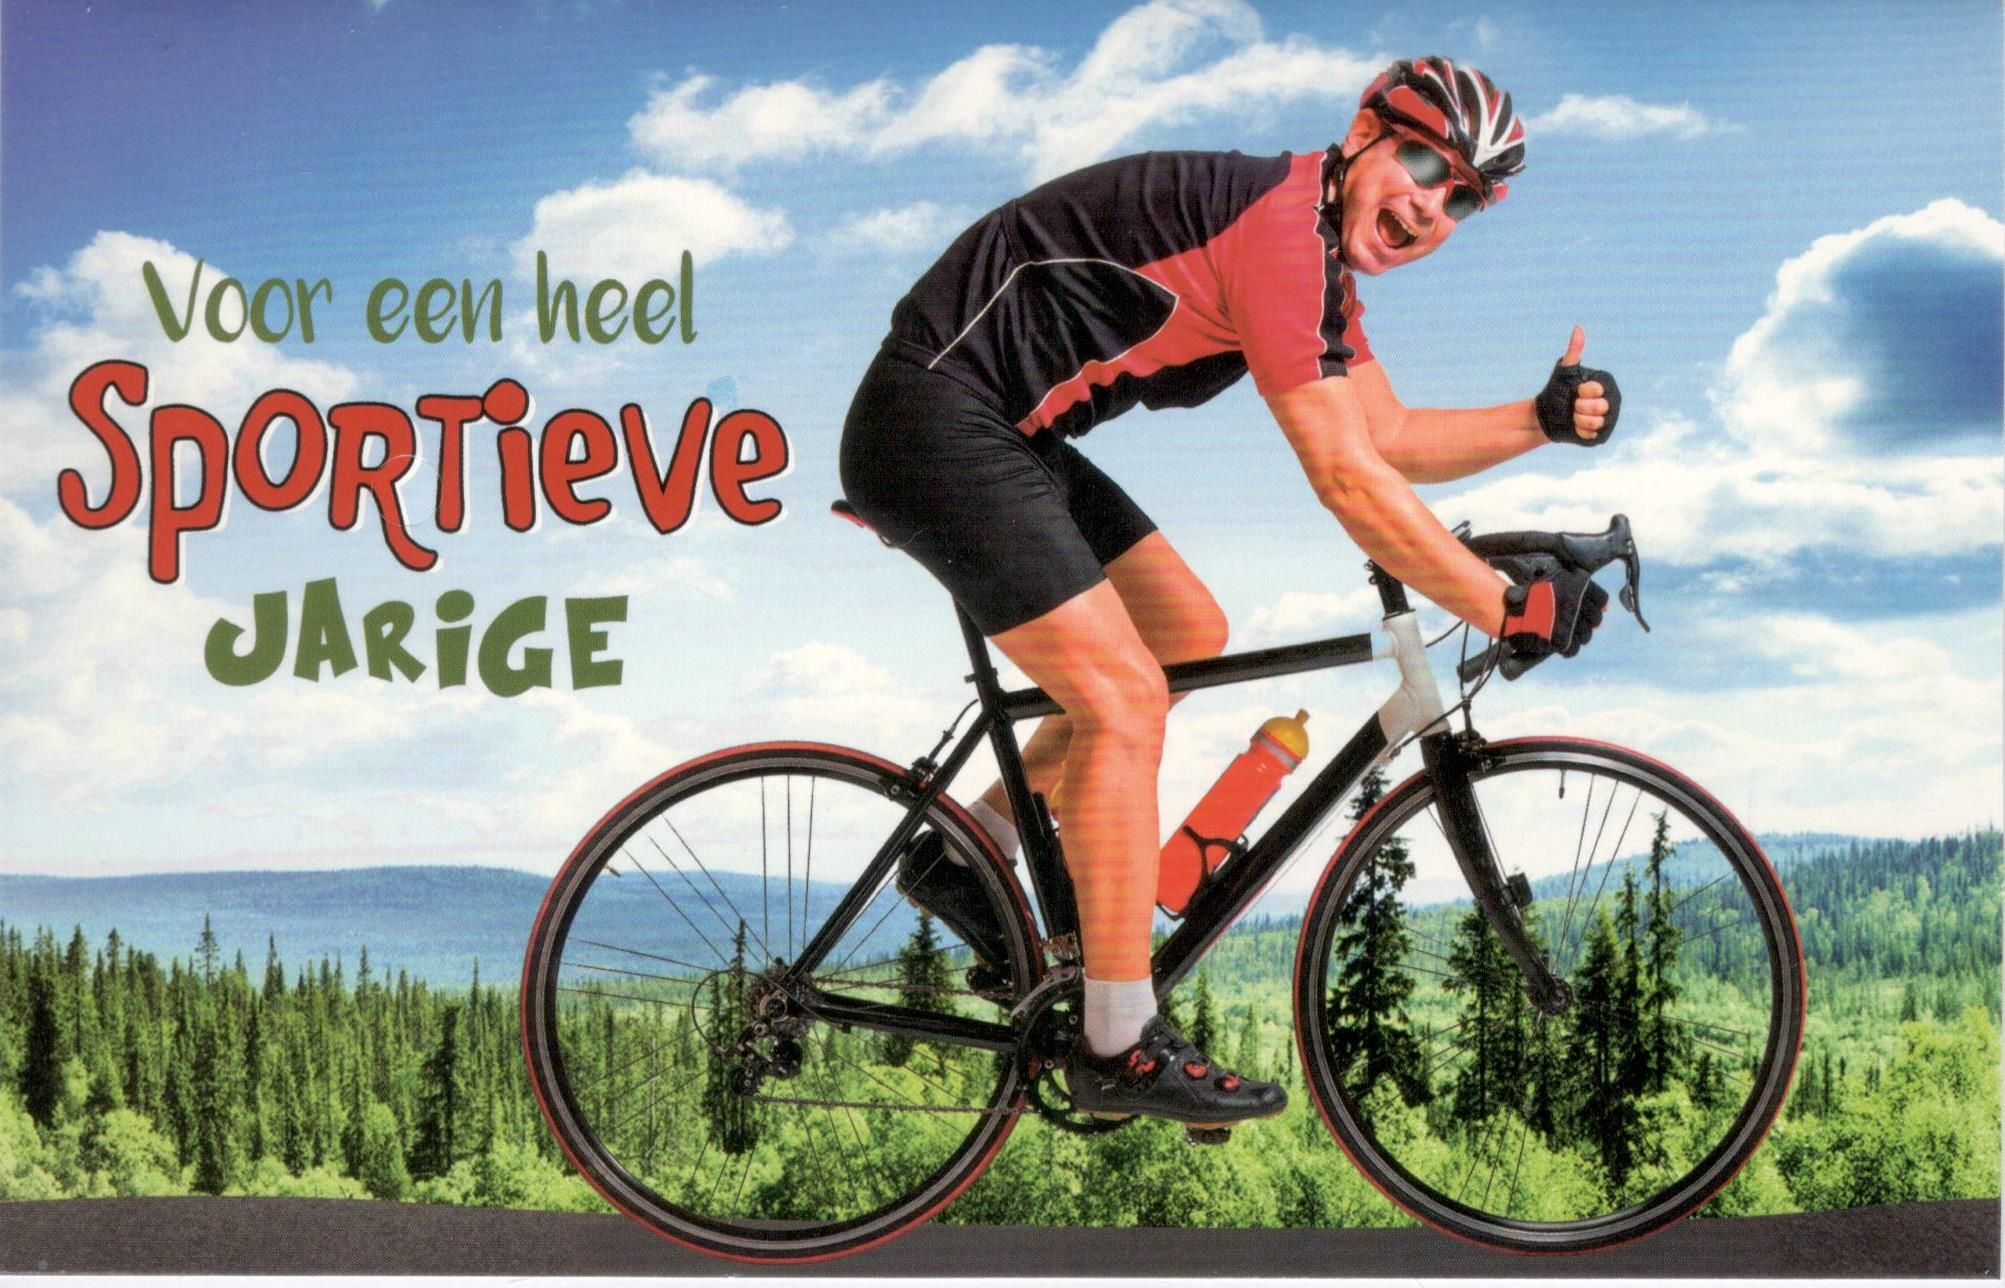 Verjaardag Man Fietser.Verjaardagskaart Voor Een Sportieve Jarige Verjaardag Man